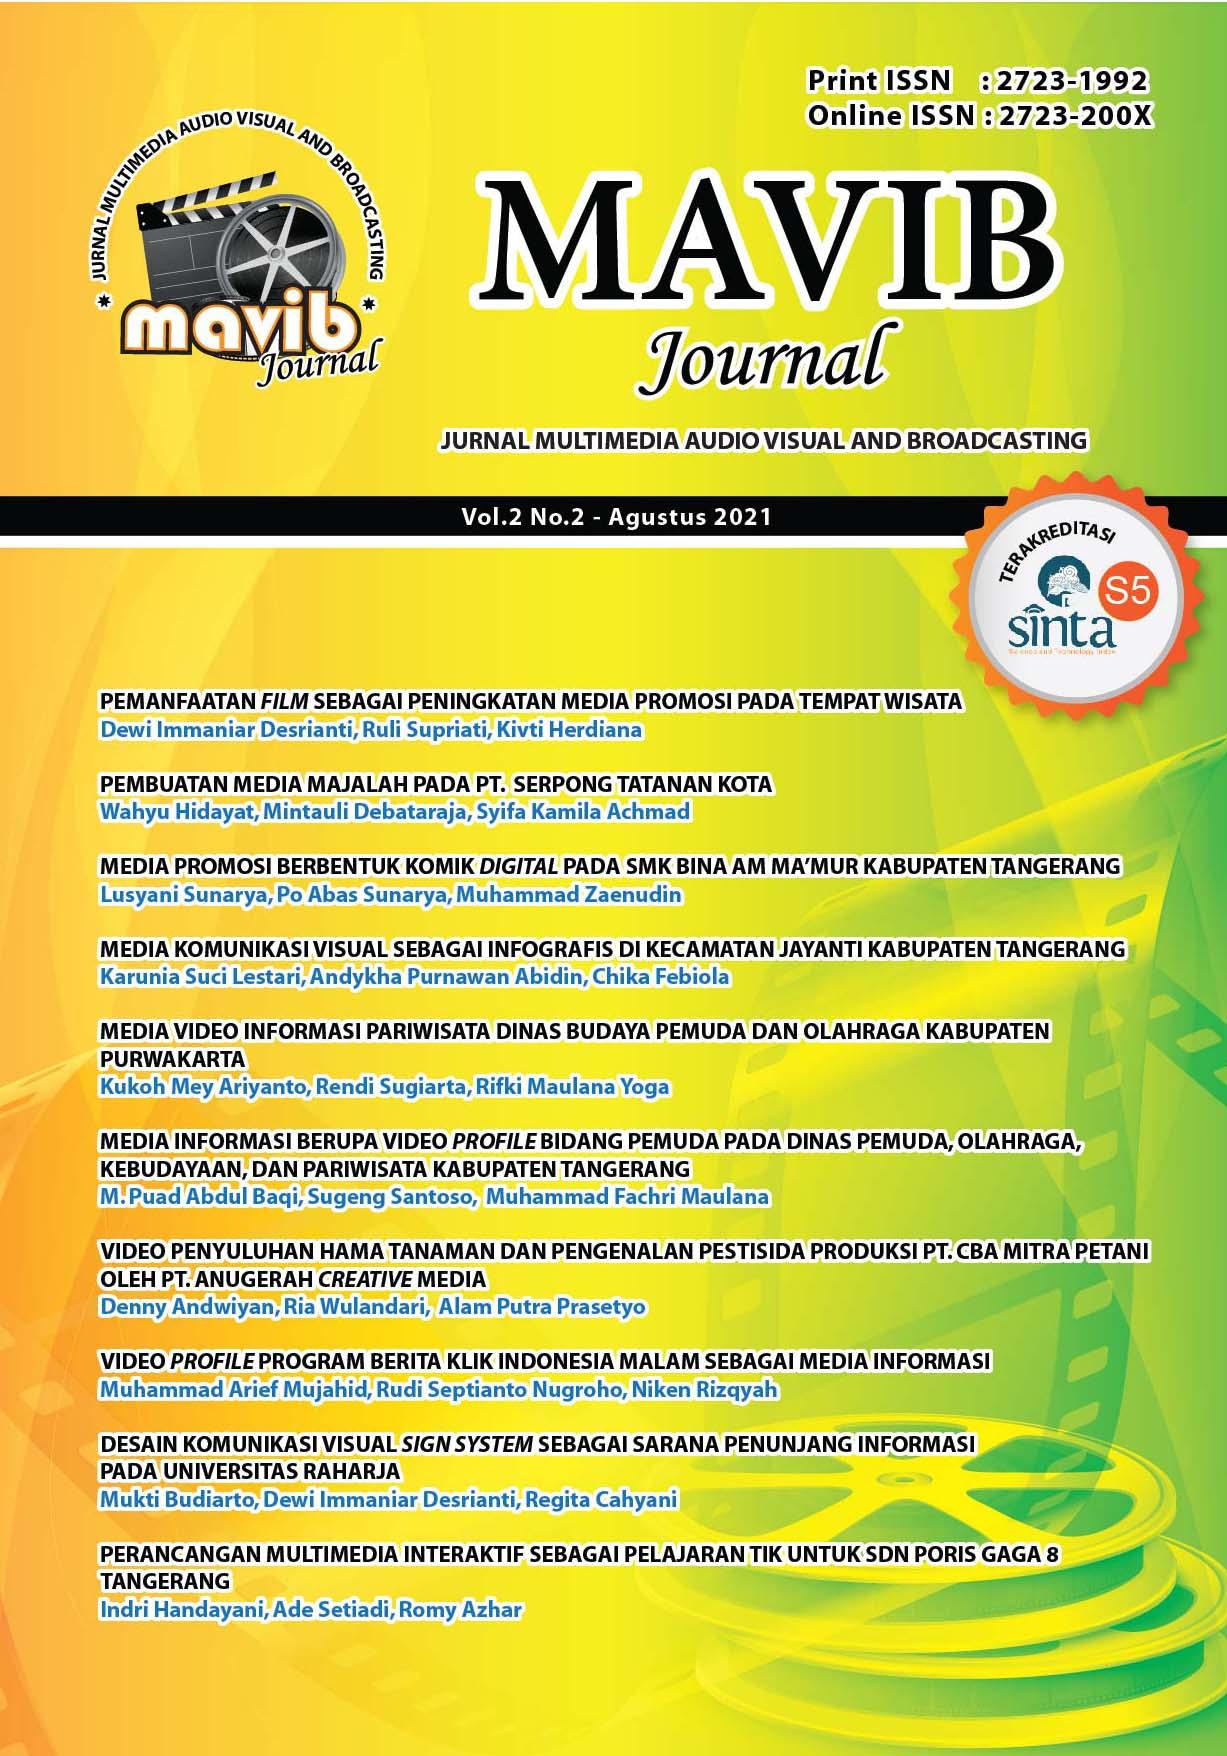 MAVIB Journal Vol. 2 No. 2 - Agustus 2021 MAVIBJournal#2021